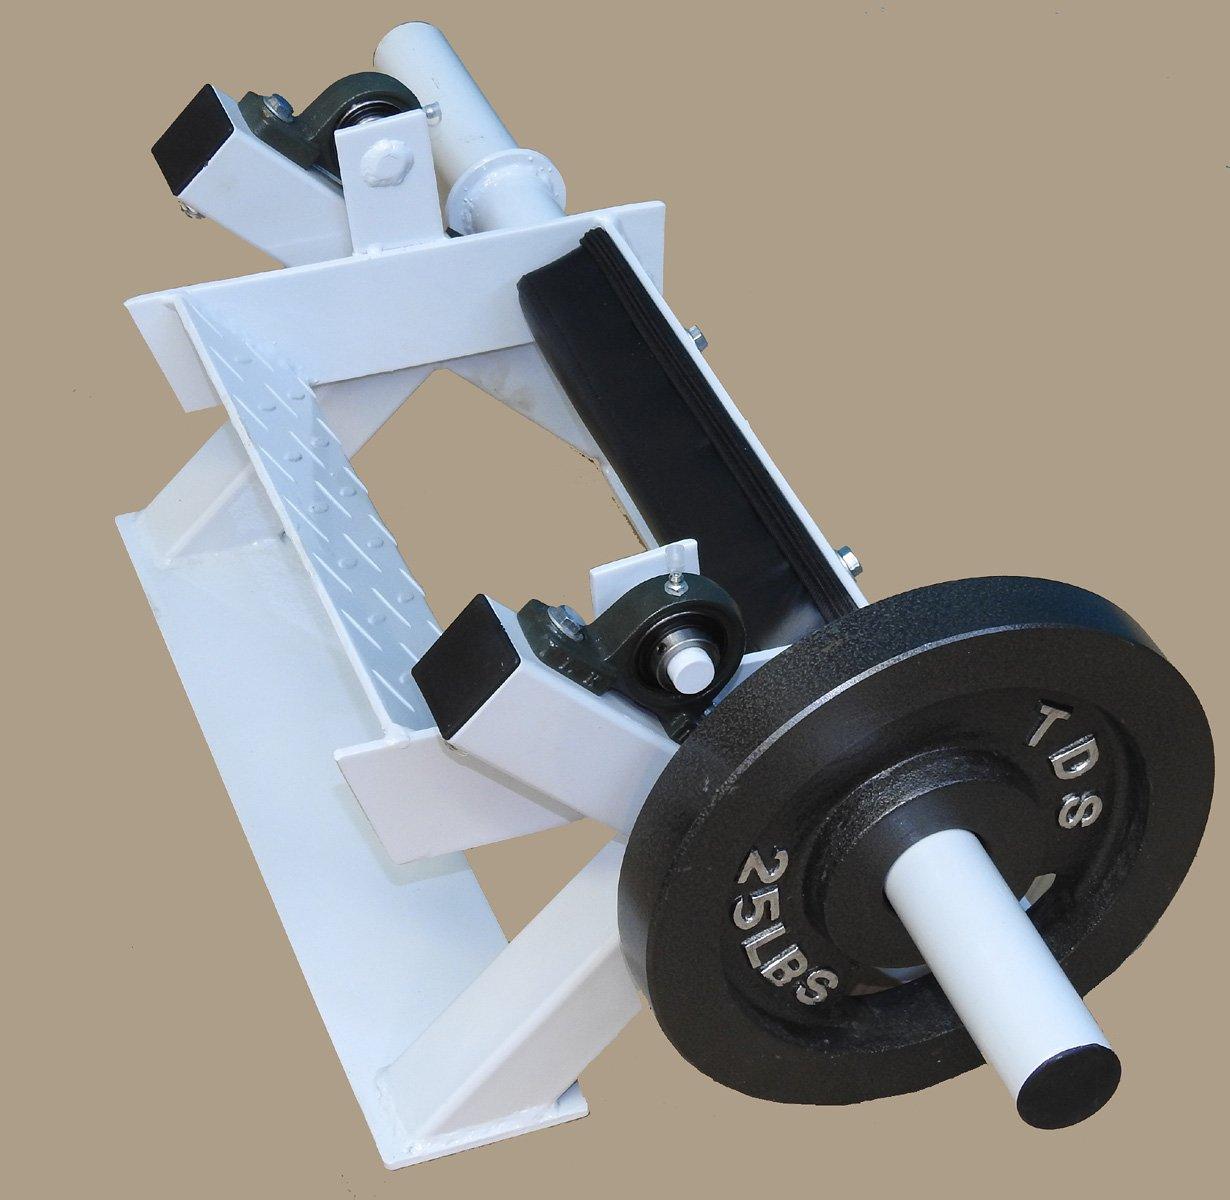 Tibia Dorsi Calf Machine by TDS (Image #6)